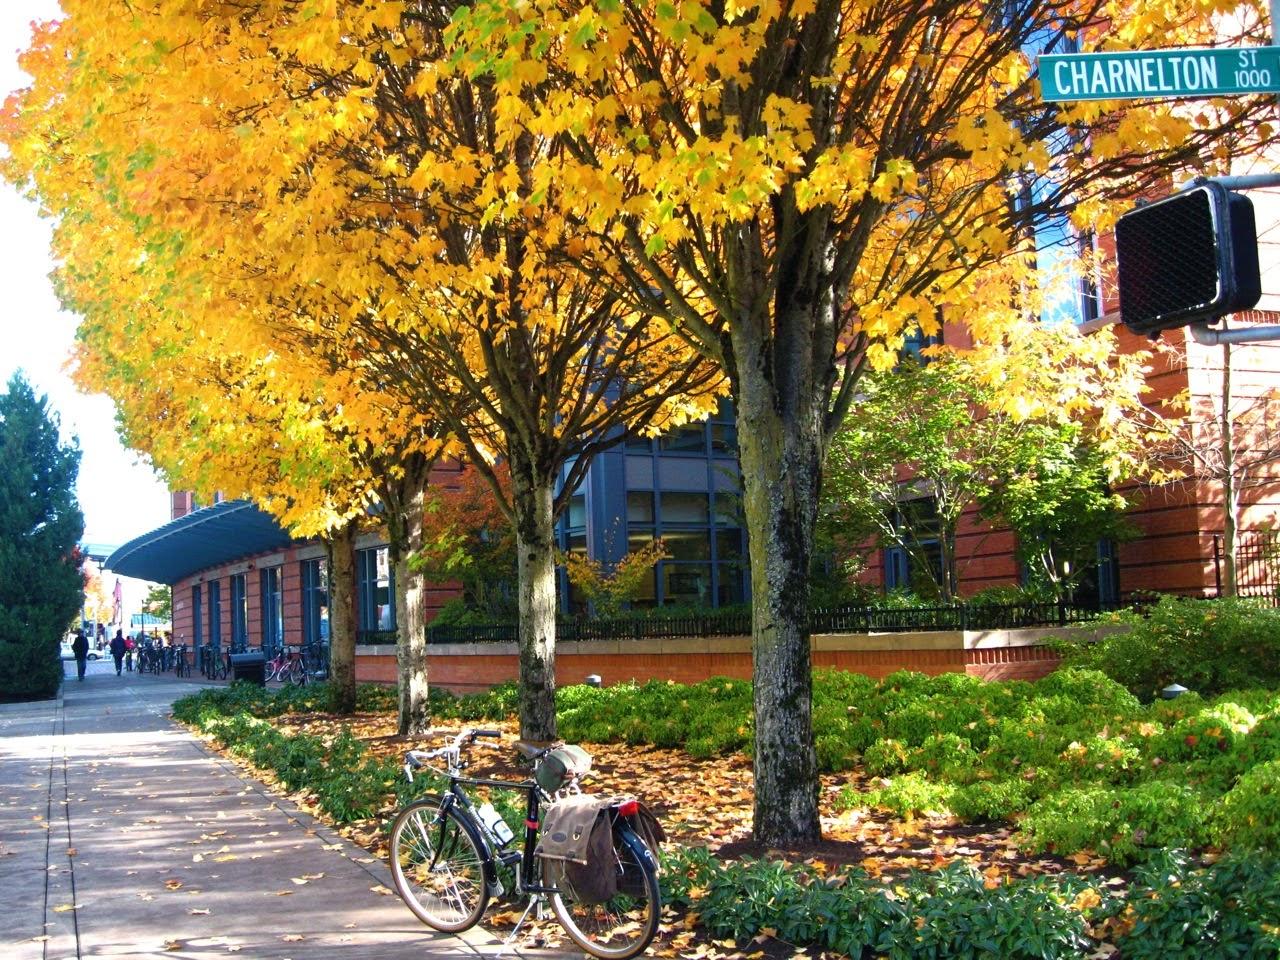 Bridgestone CB-Zip, fall , Eugene Oregon, B-Stone CB-Zero, trees, leaves, bike